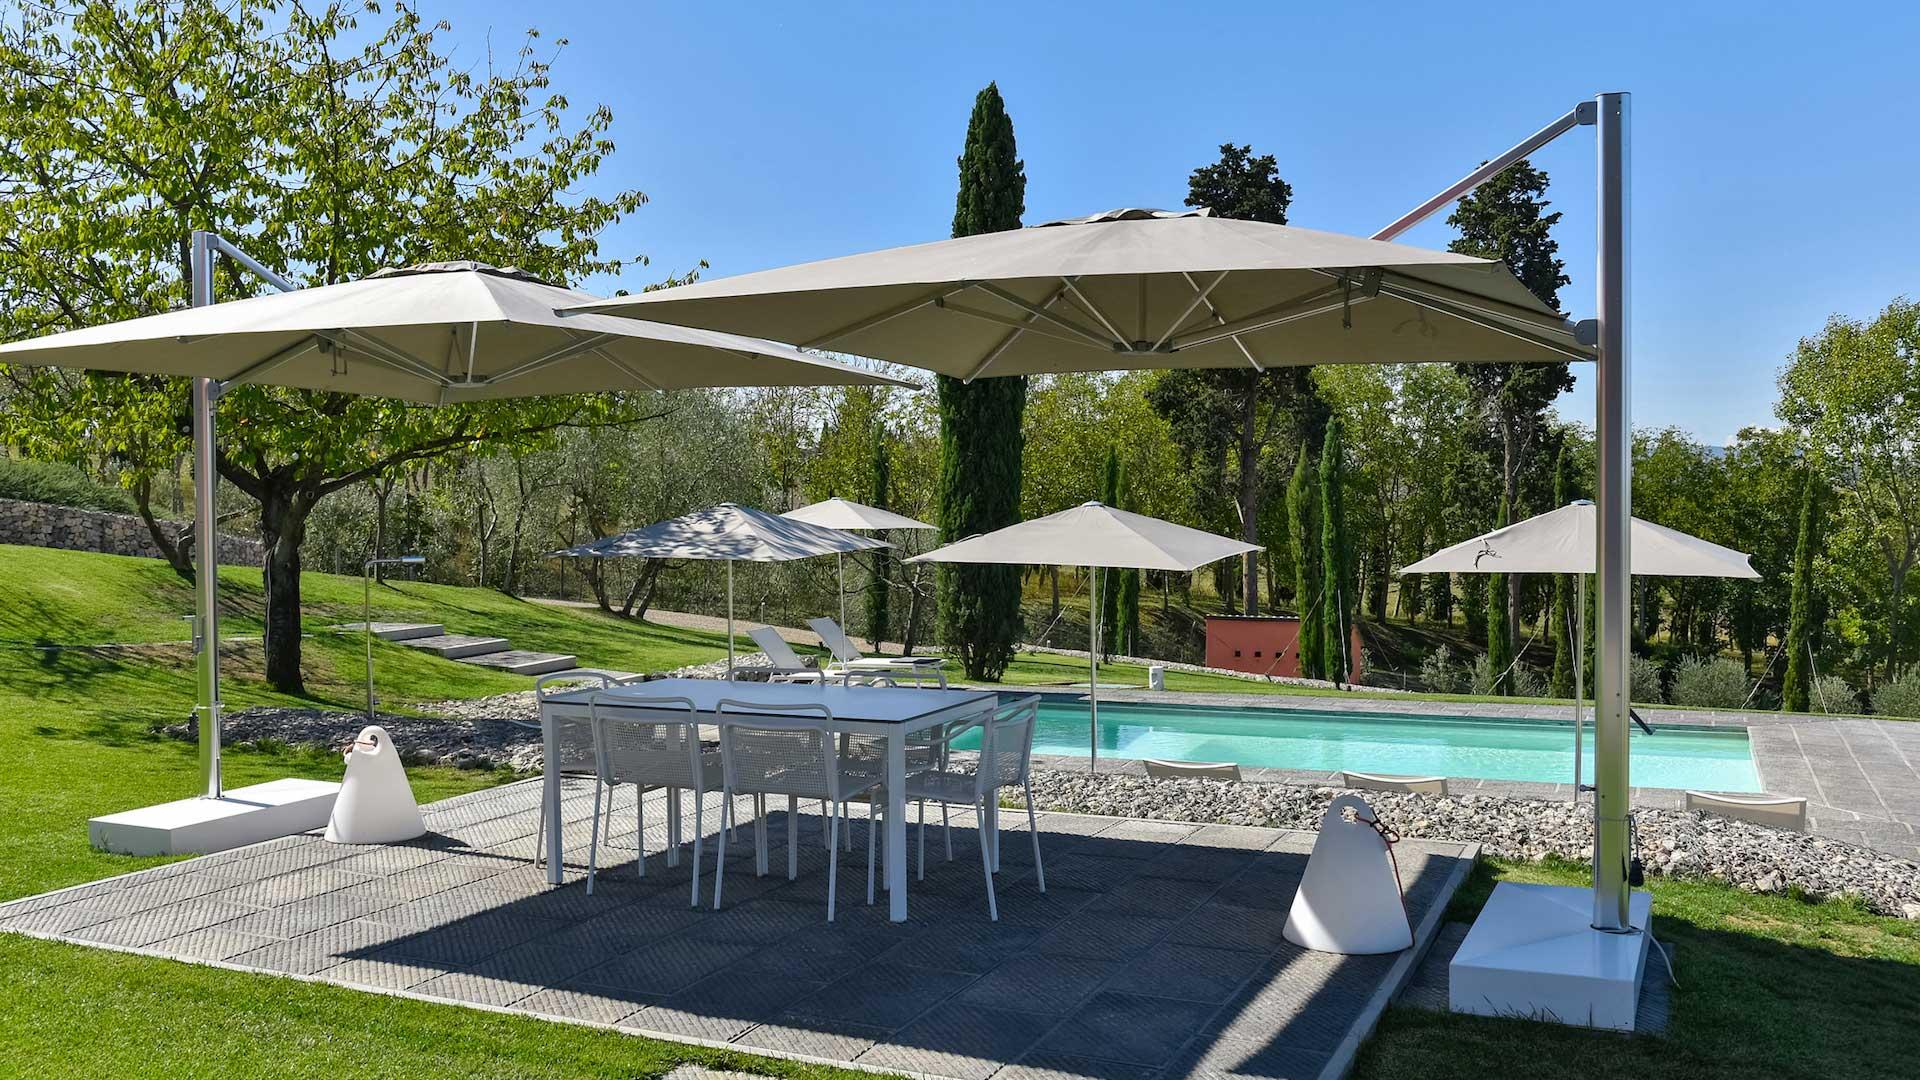 Villa Cortona Due Villa 224 Louer 224 Toscane Toscane Est